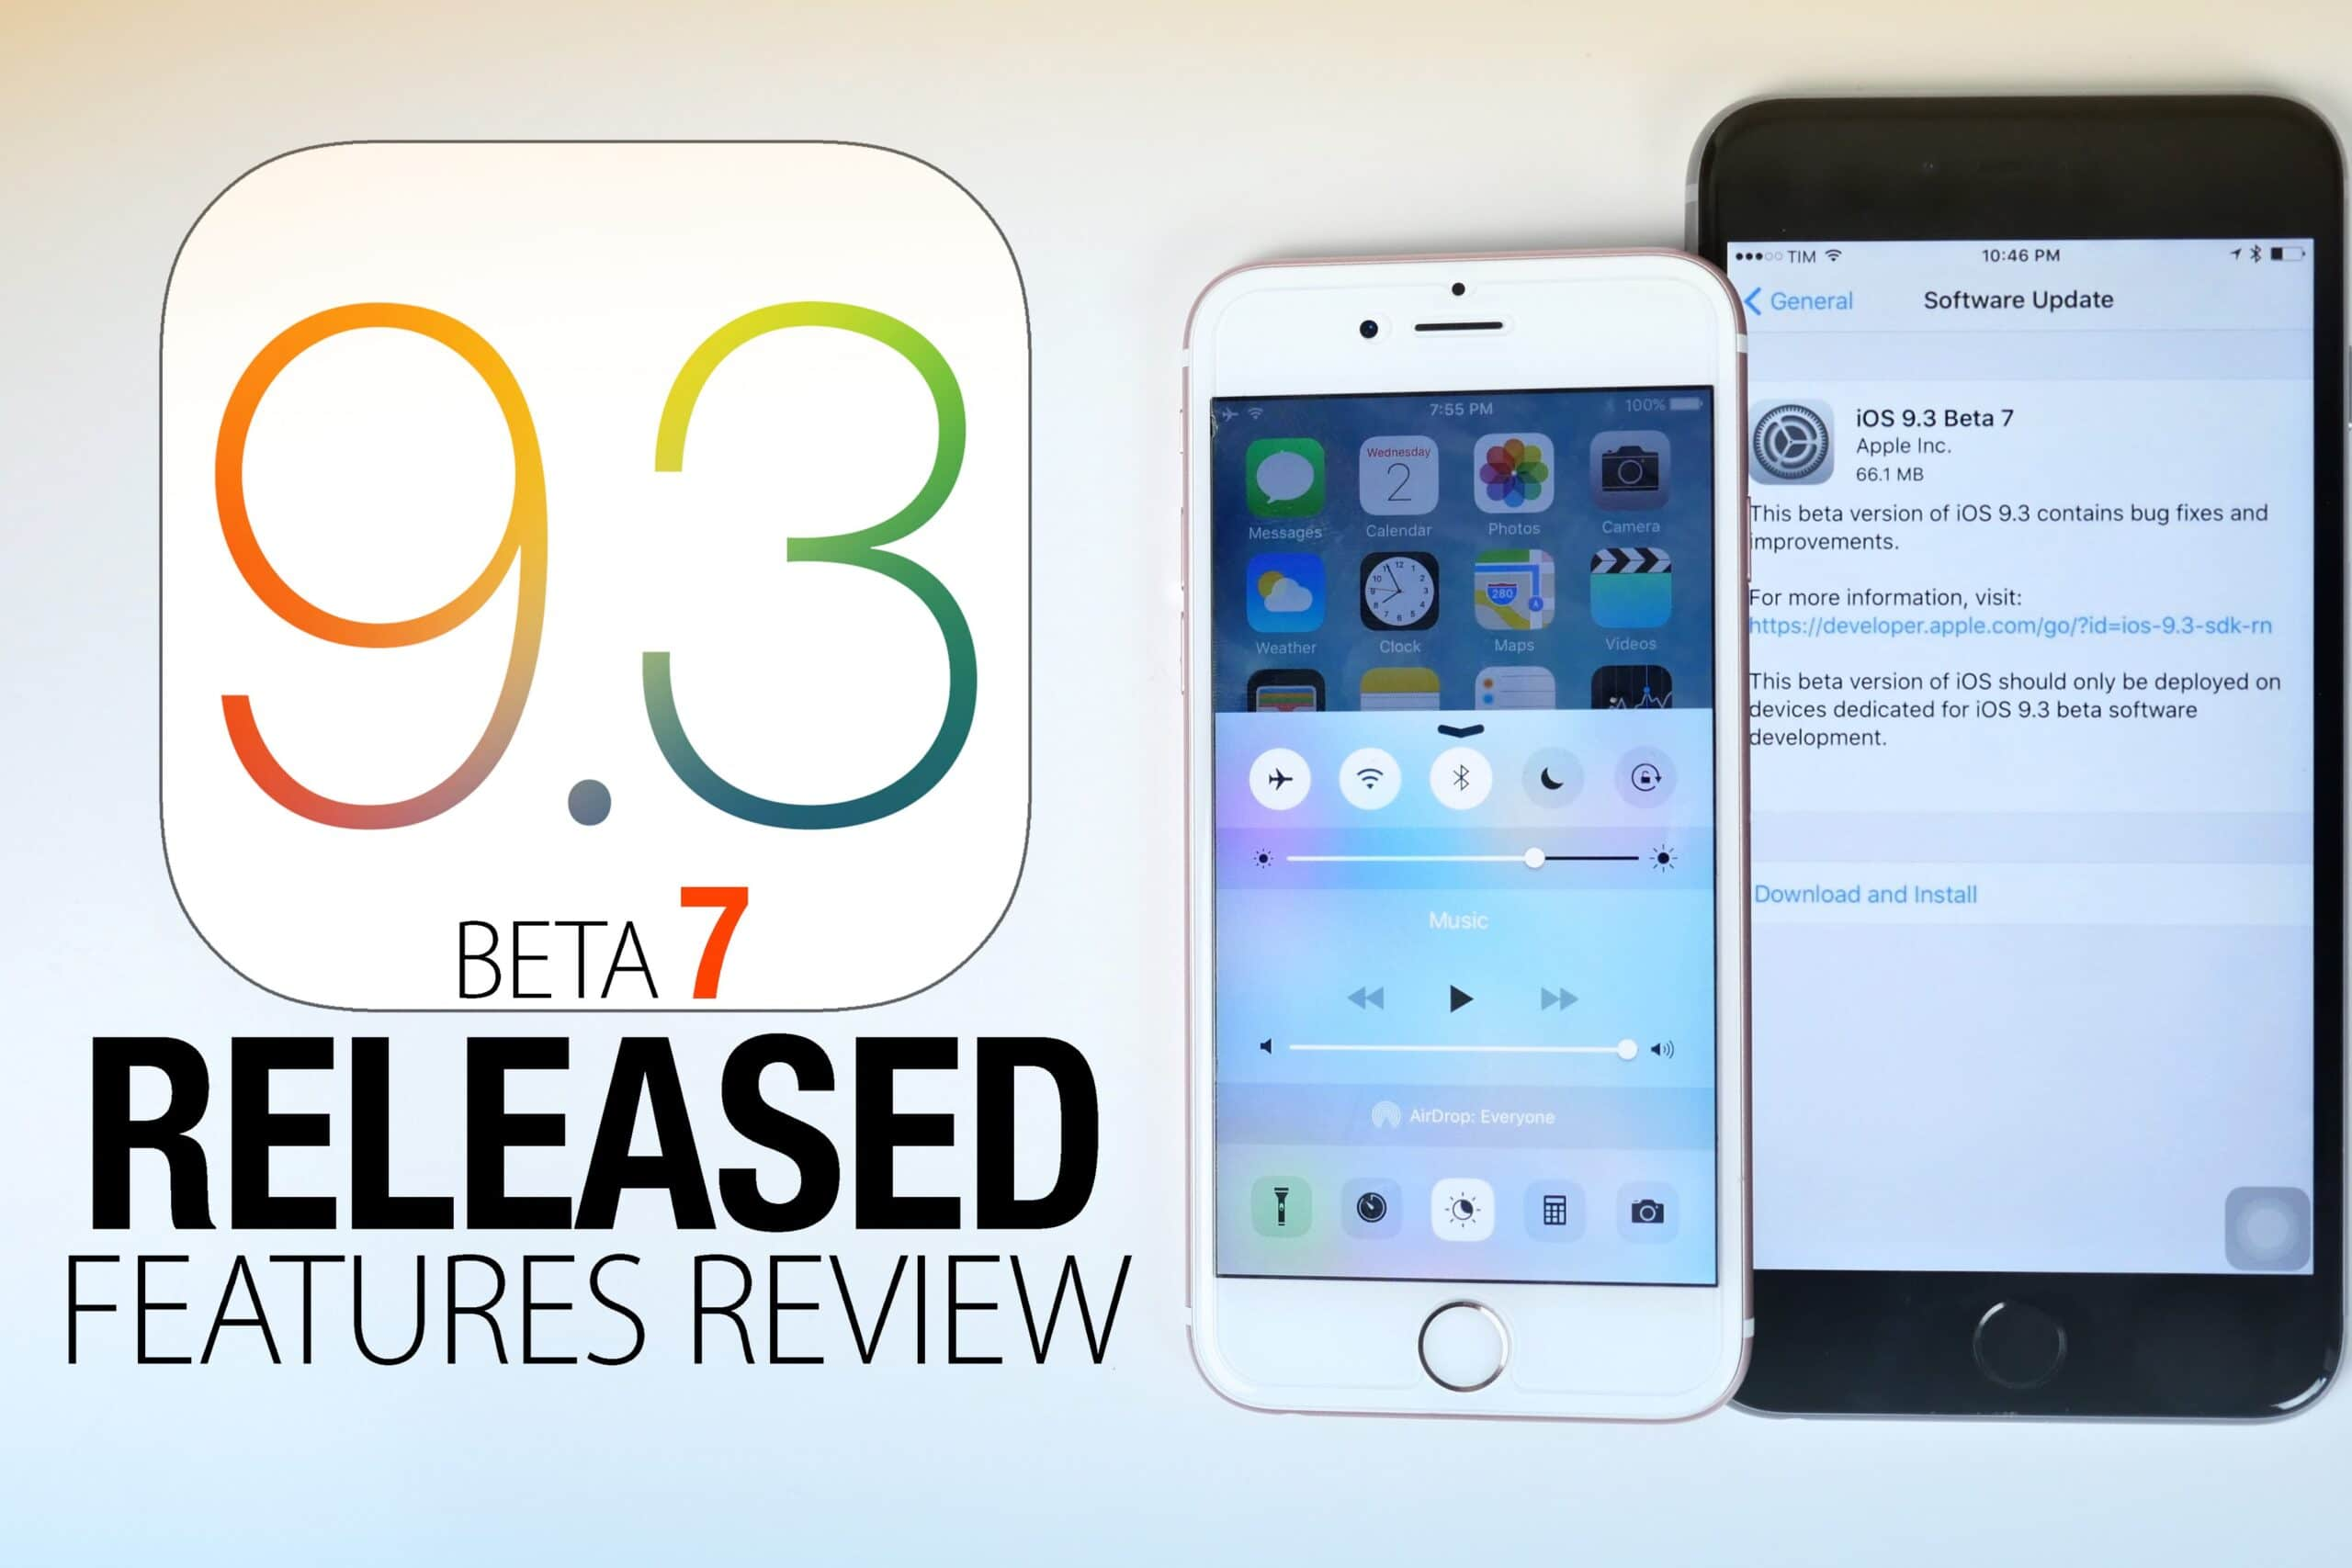 Download and Install iOS 9 3 beta 7 (13E5233a / 13E5234a) Ipsw Links